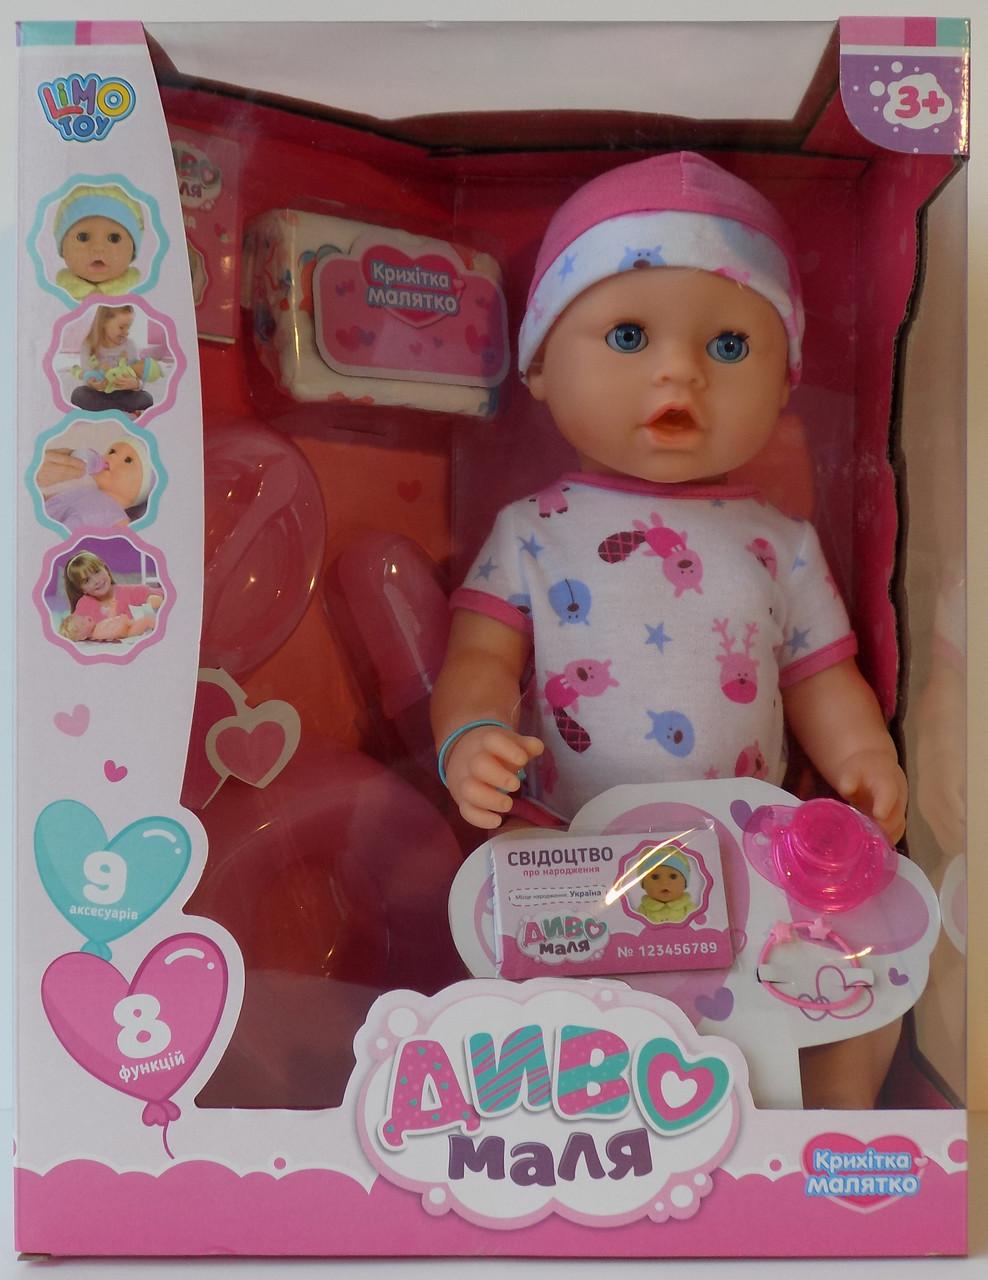 Пупс Baby born беби борн Диво маля YL1899G